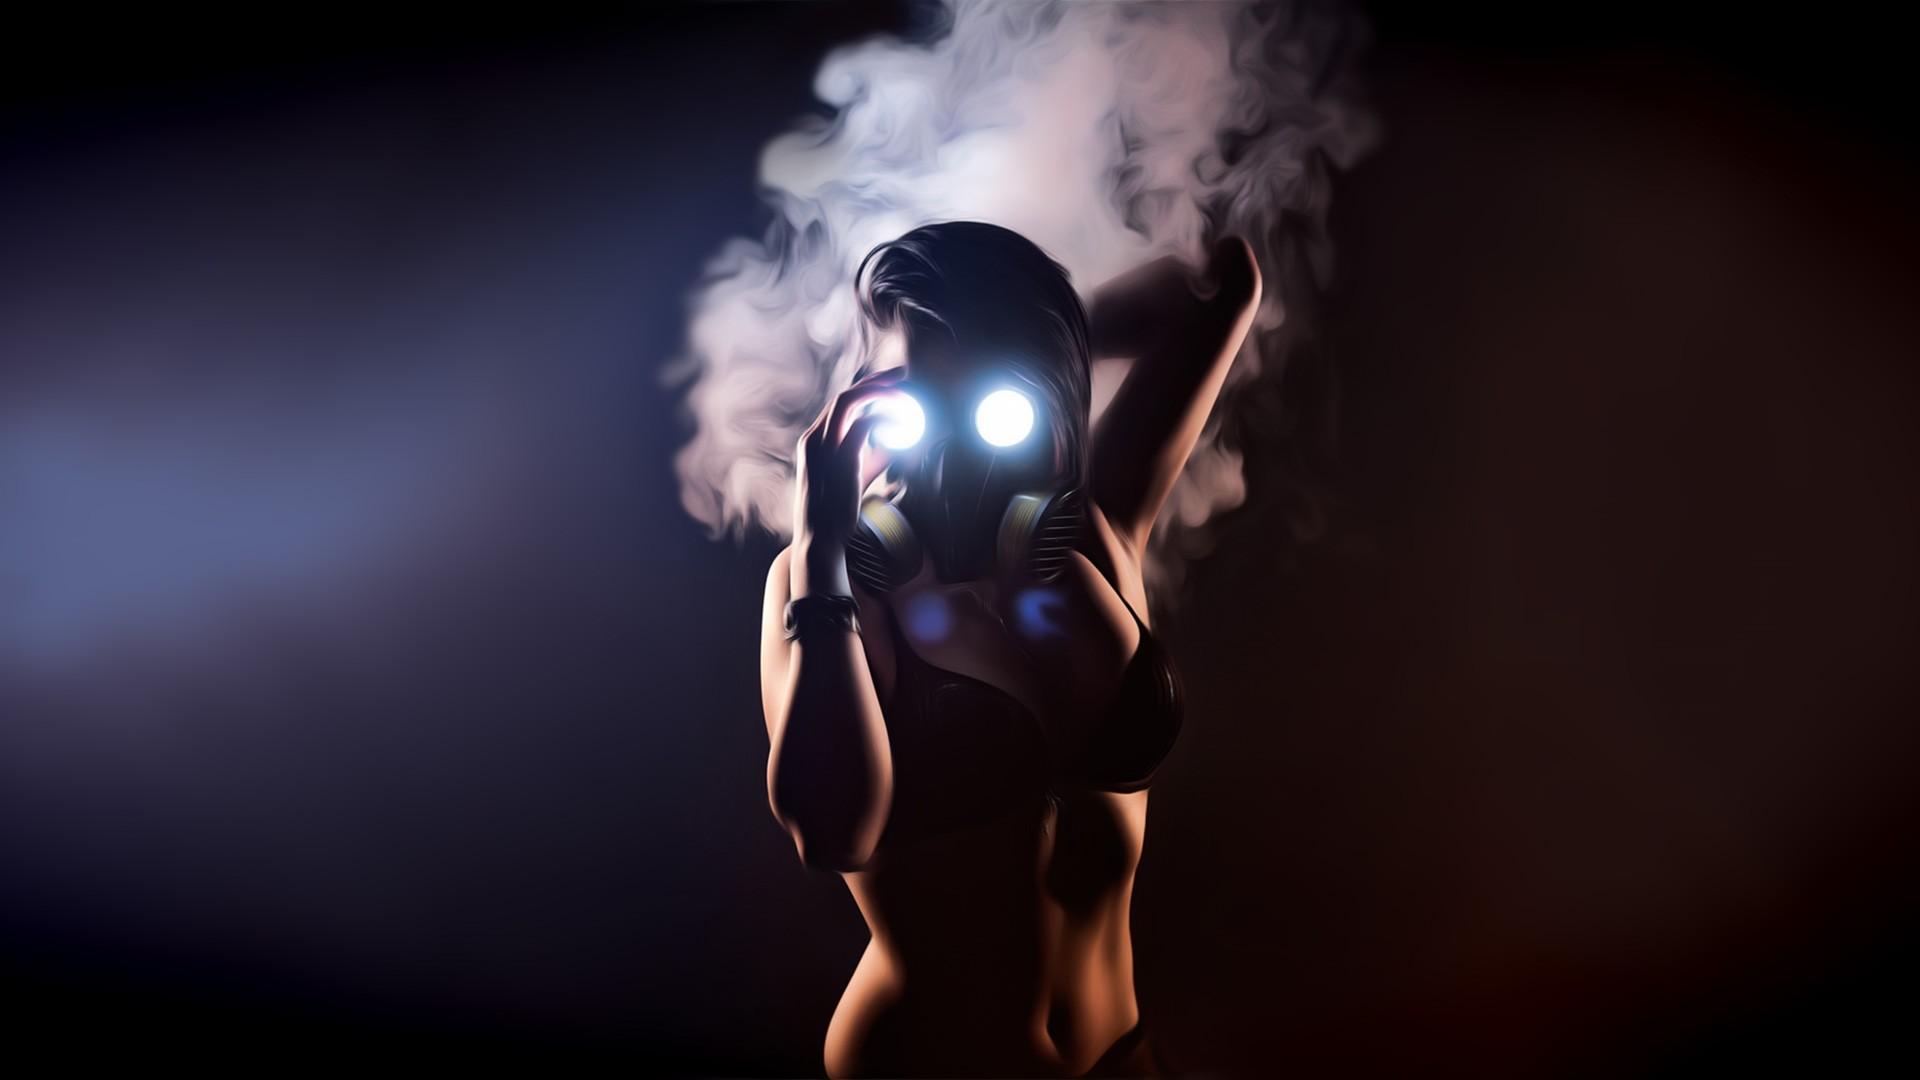 Wallpaper Women Model Gas Masks Photography Glowing Smoke Romantically Apocalyptic Light Darkness Screenshot Computer Wallpaper 1920x1080 Stan461609 357893 Hd Wallpapers Wallhere